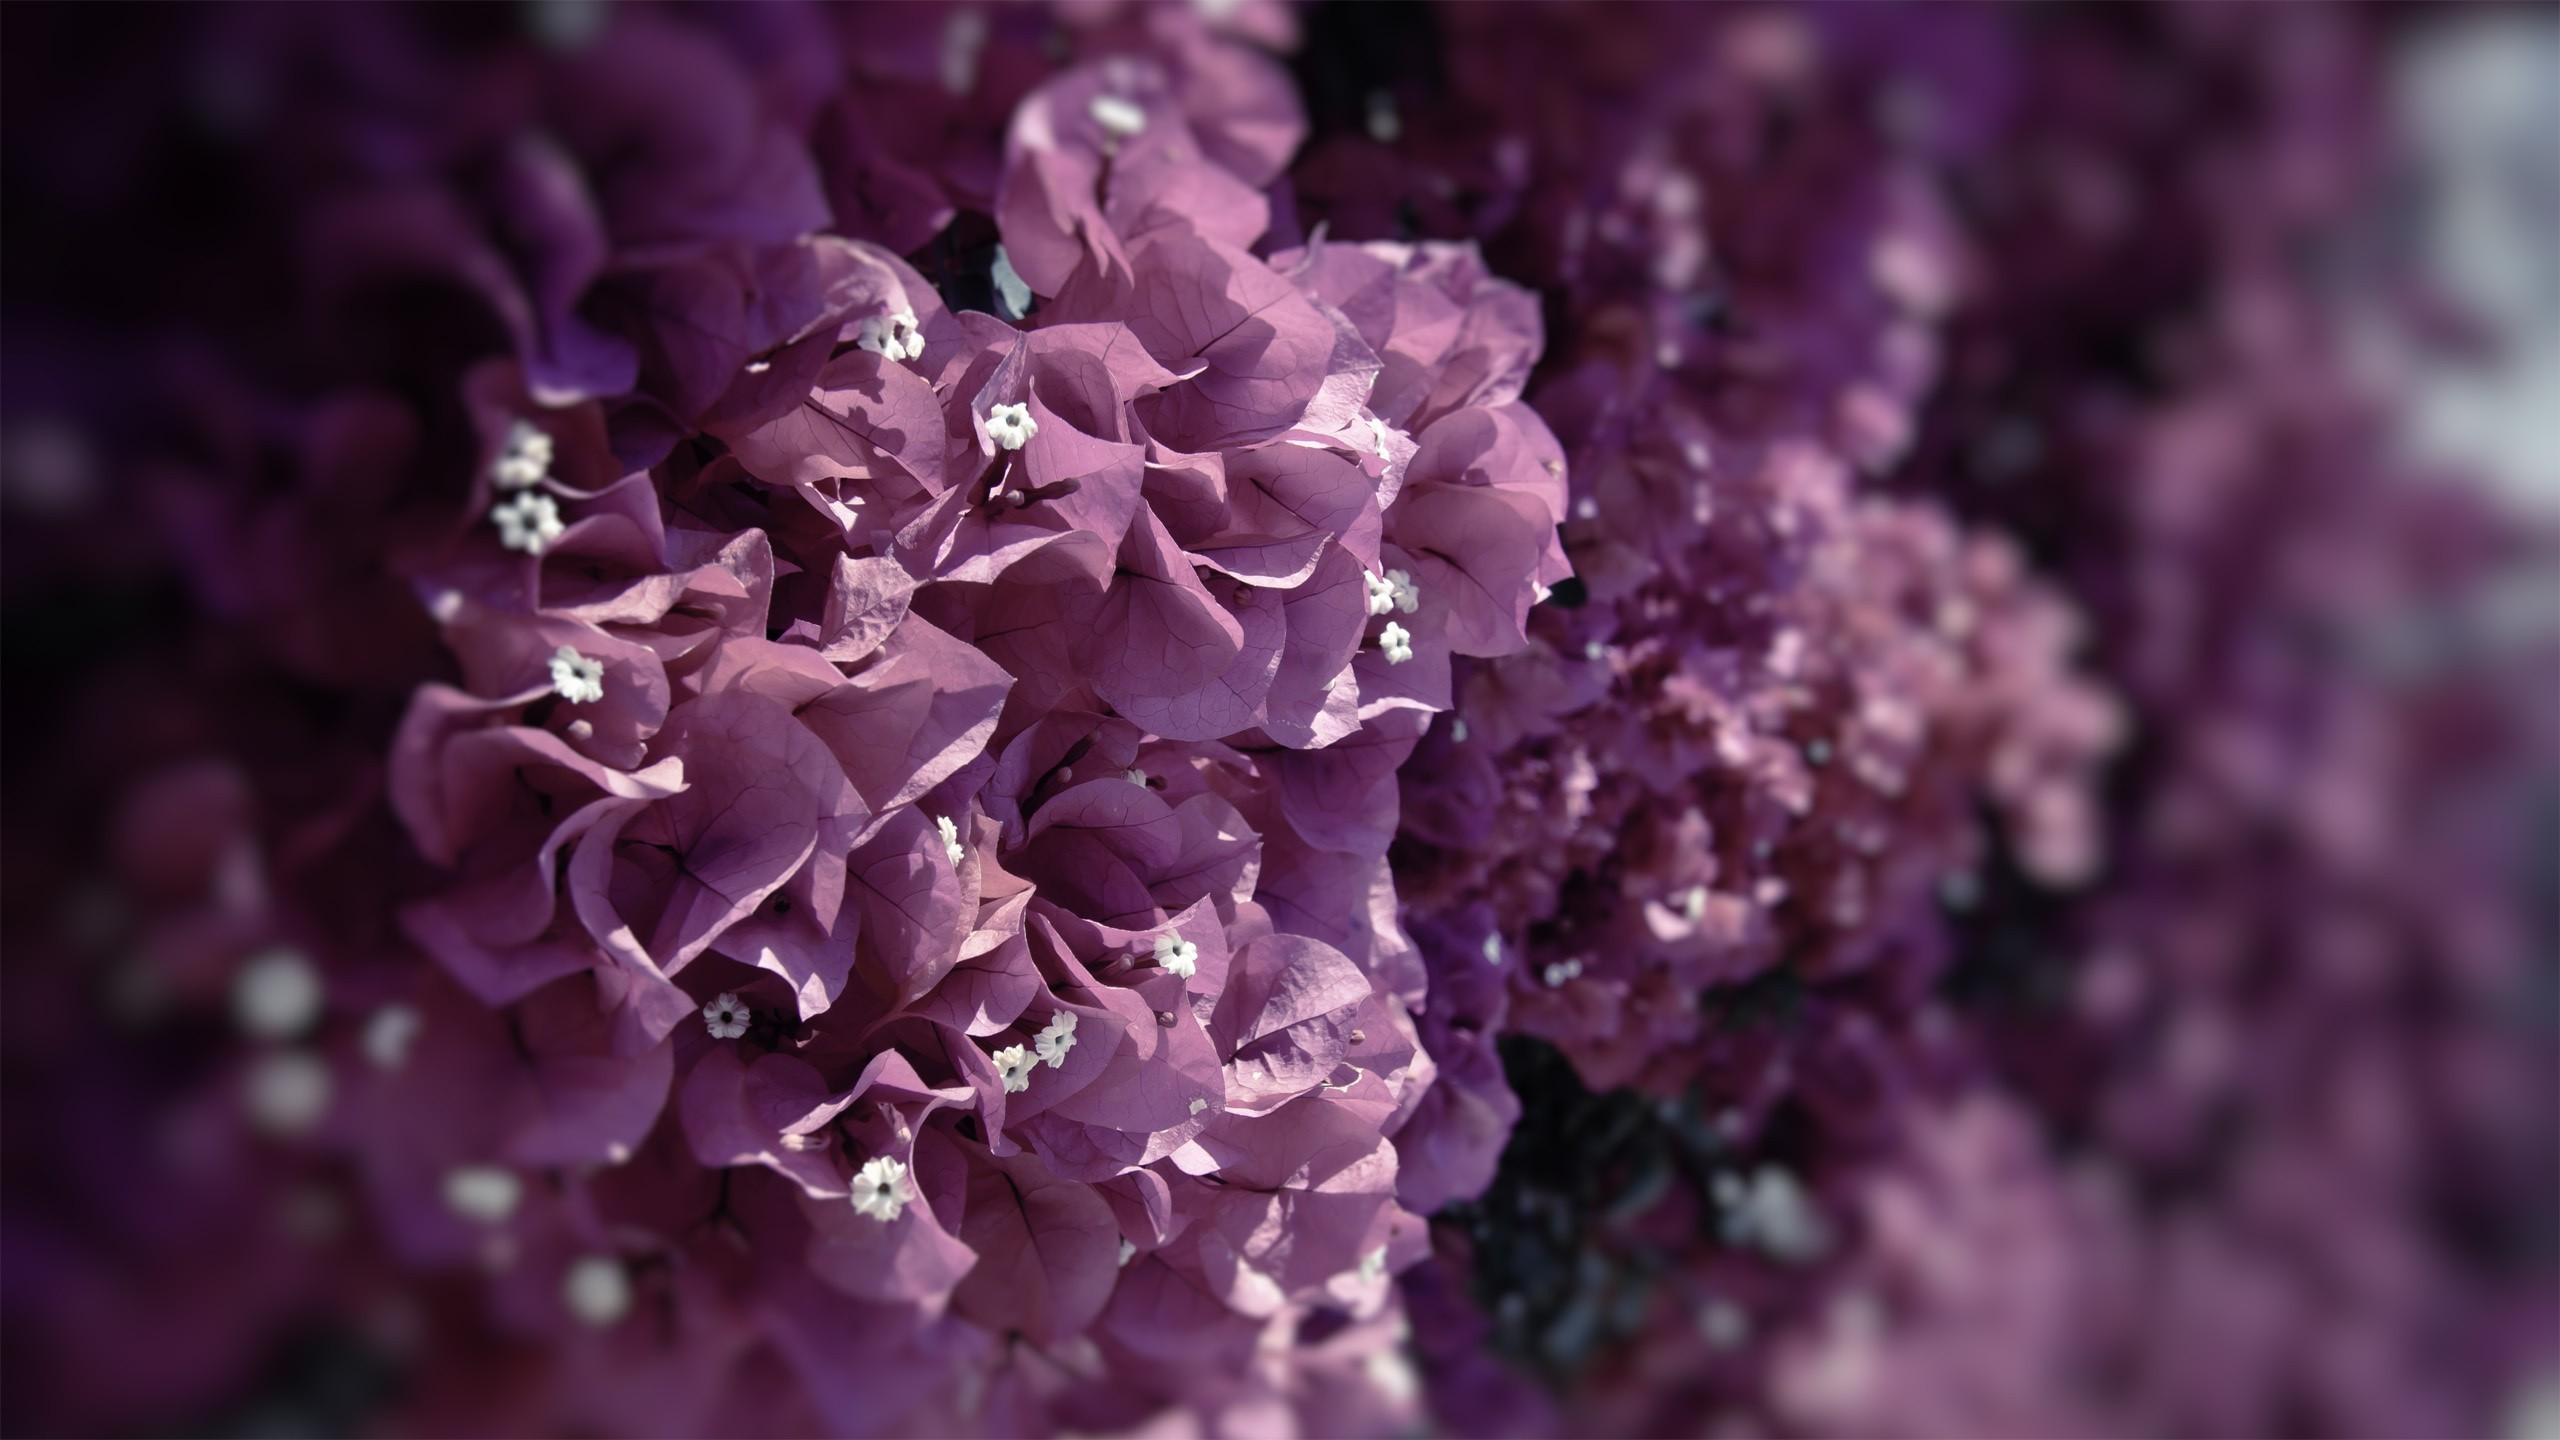 fond d'écran : feuilles, fleurs roses, la nature, les plantes, la